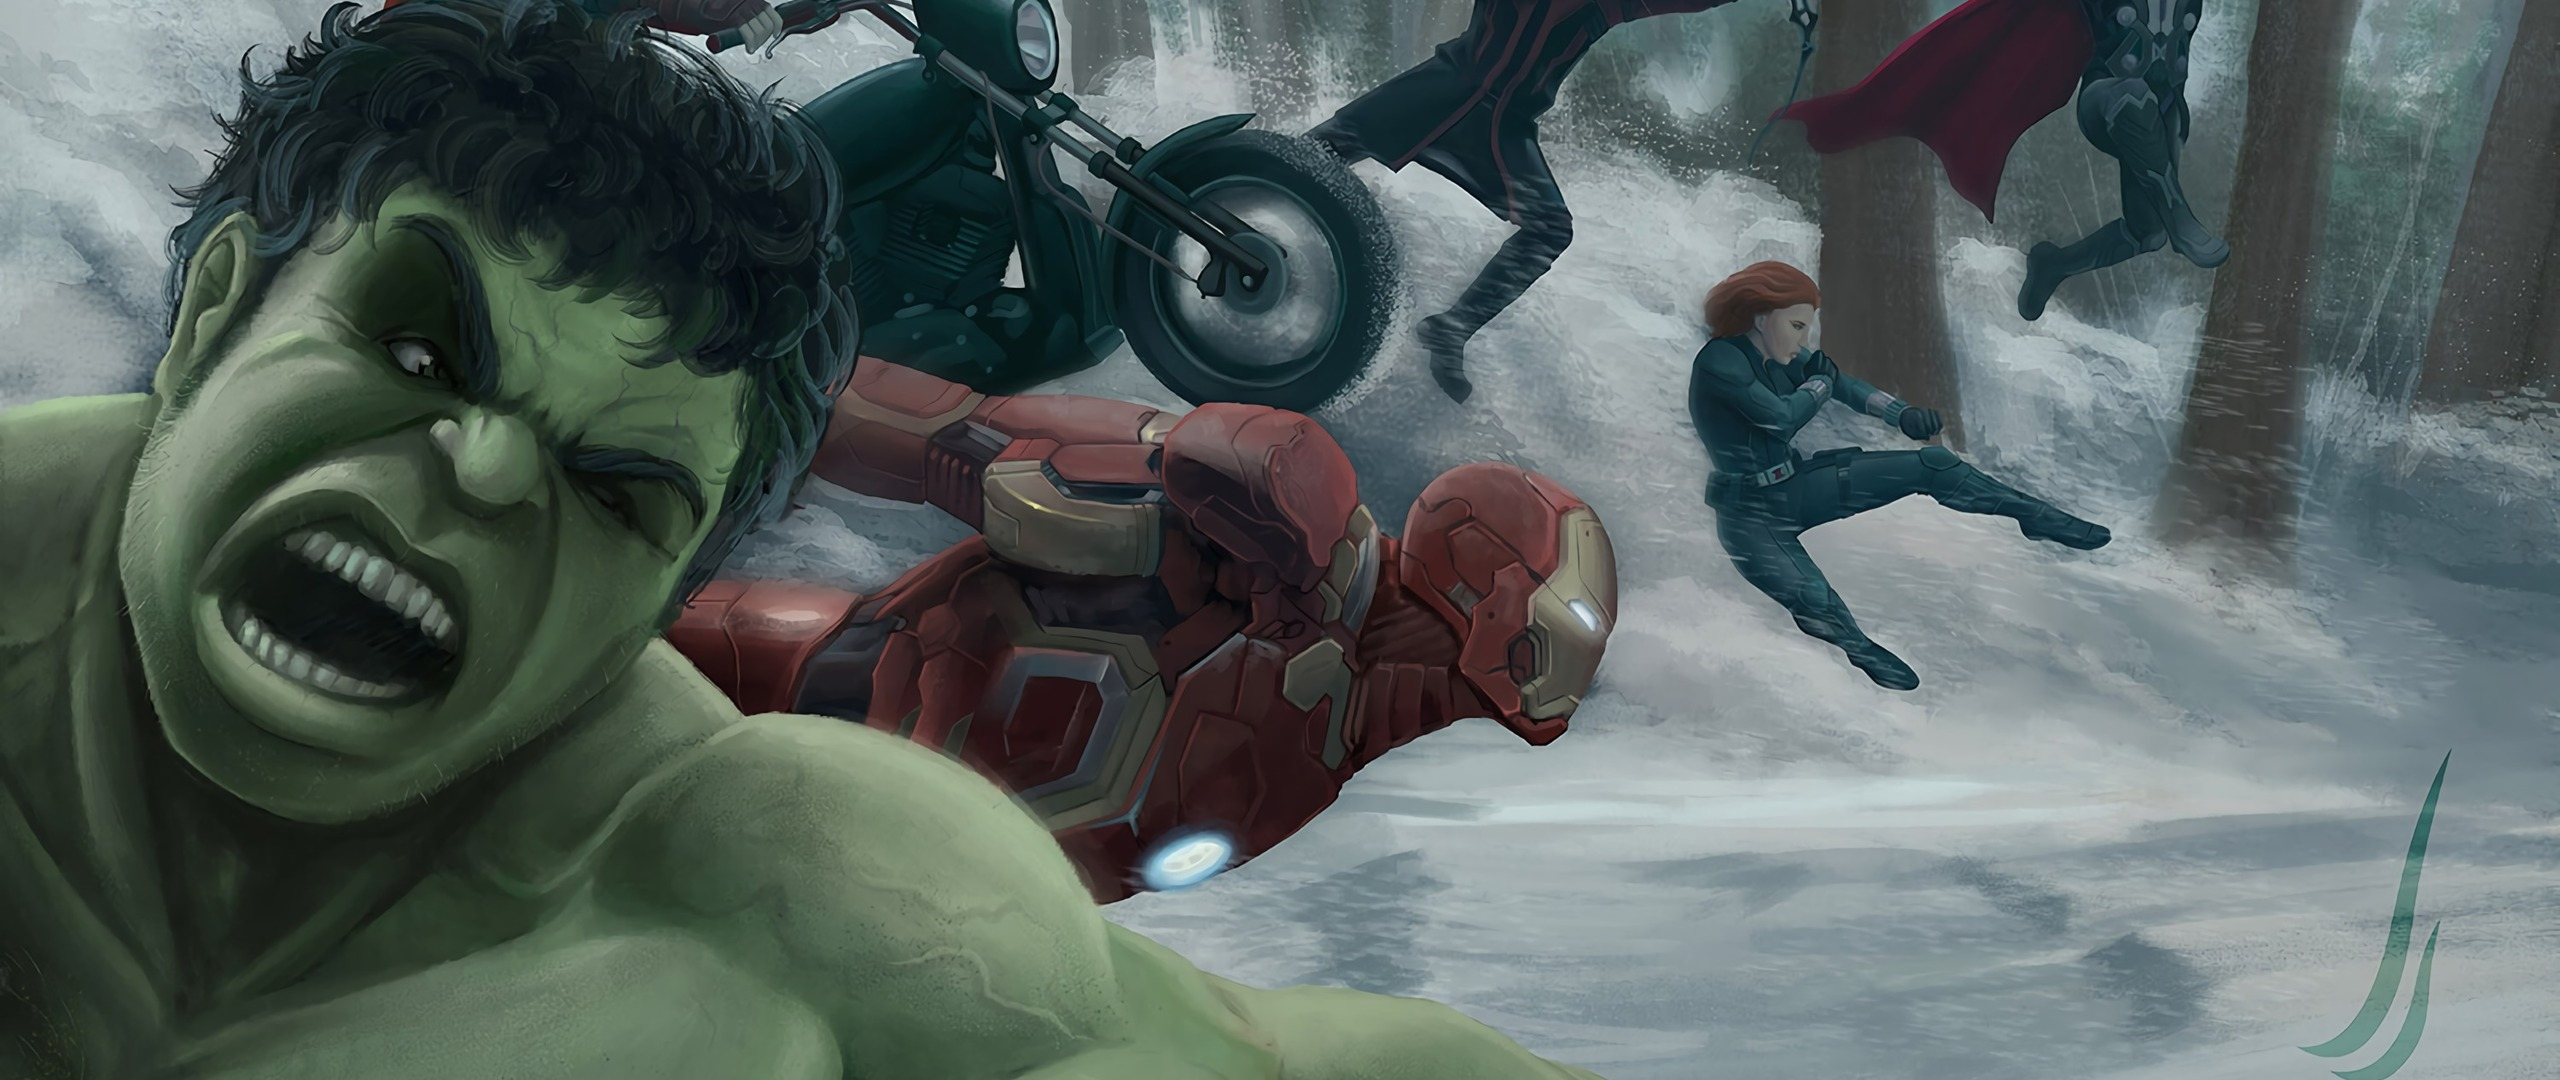 avengers-assemble-fanart-ia.jpg